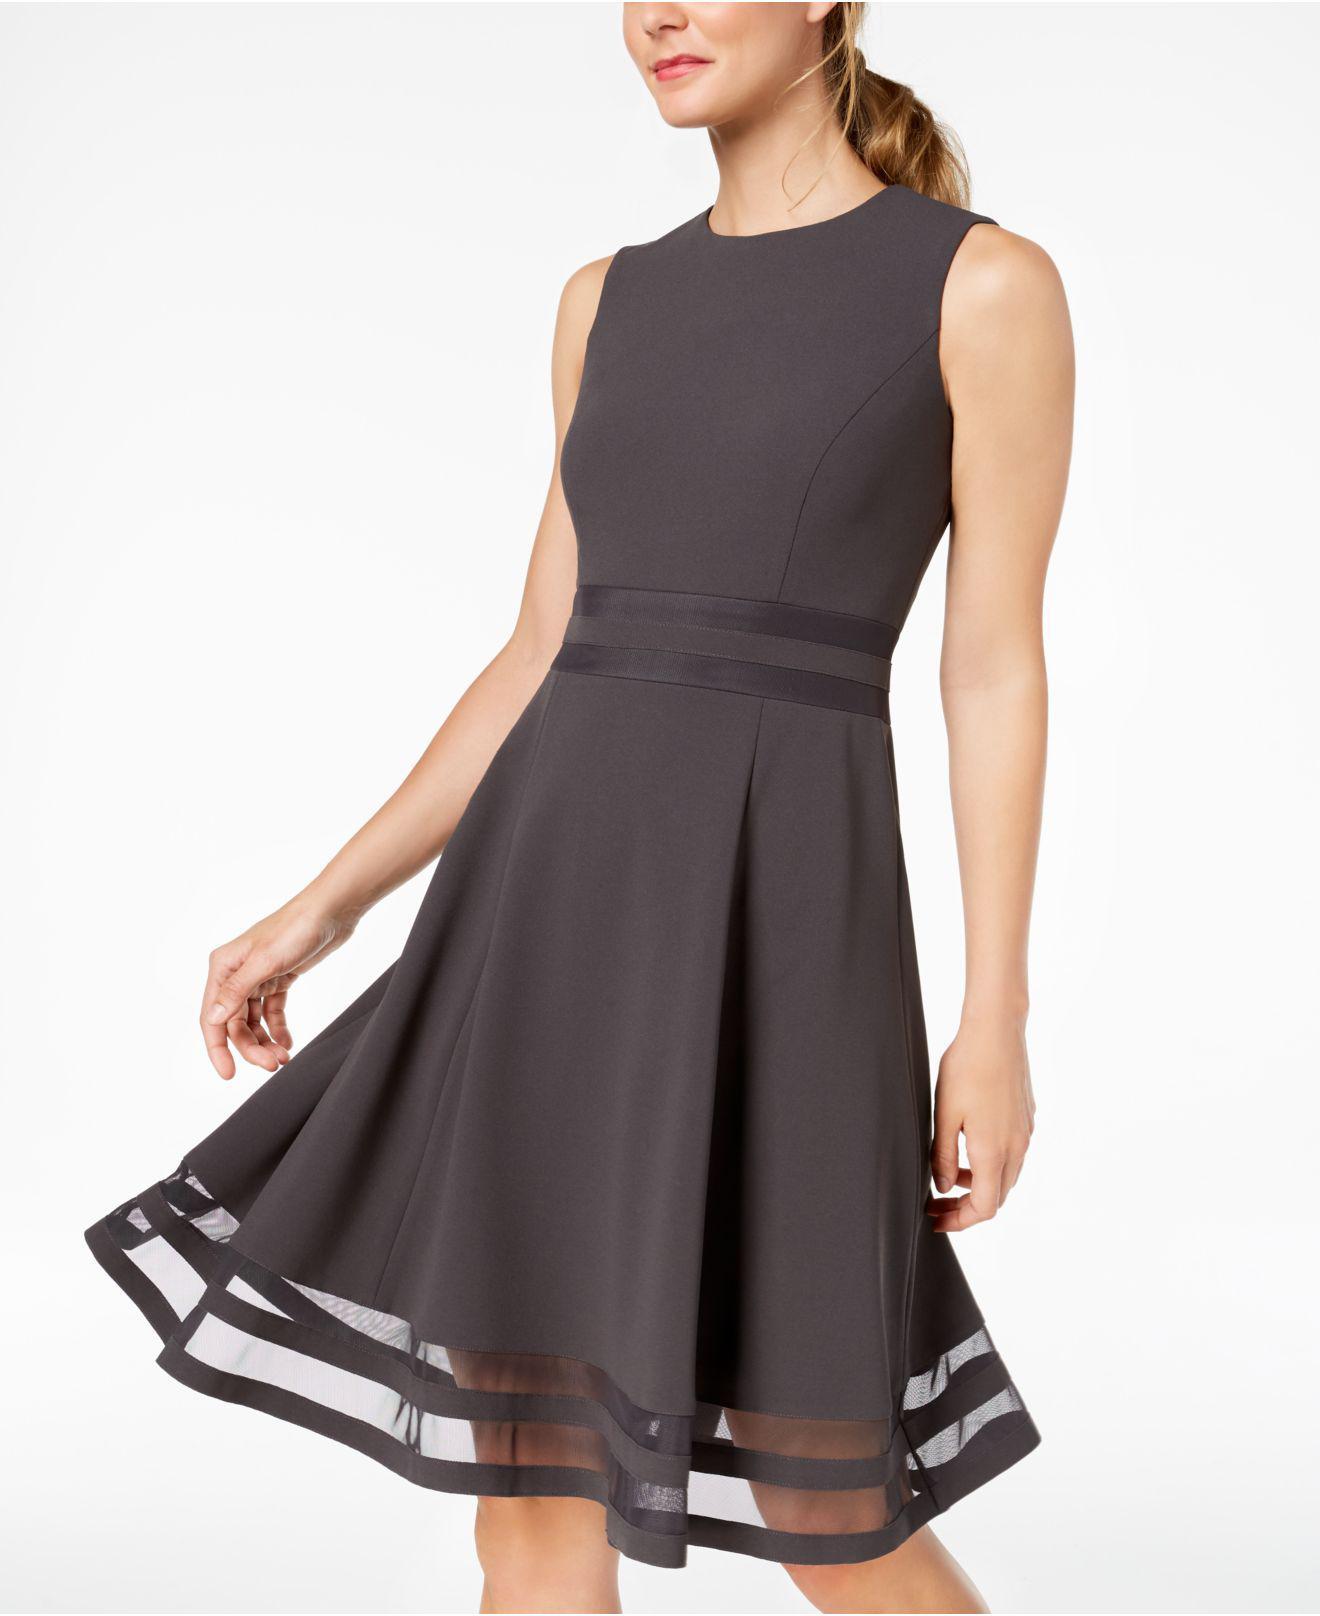 b11d30ce7bb Lyst - Calvin Klein Illusion-trim Fit   Flare Dress in Black